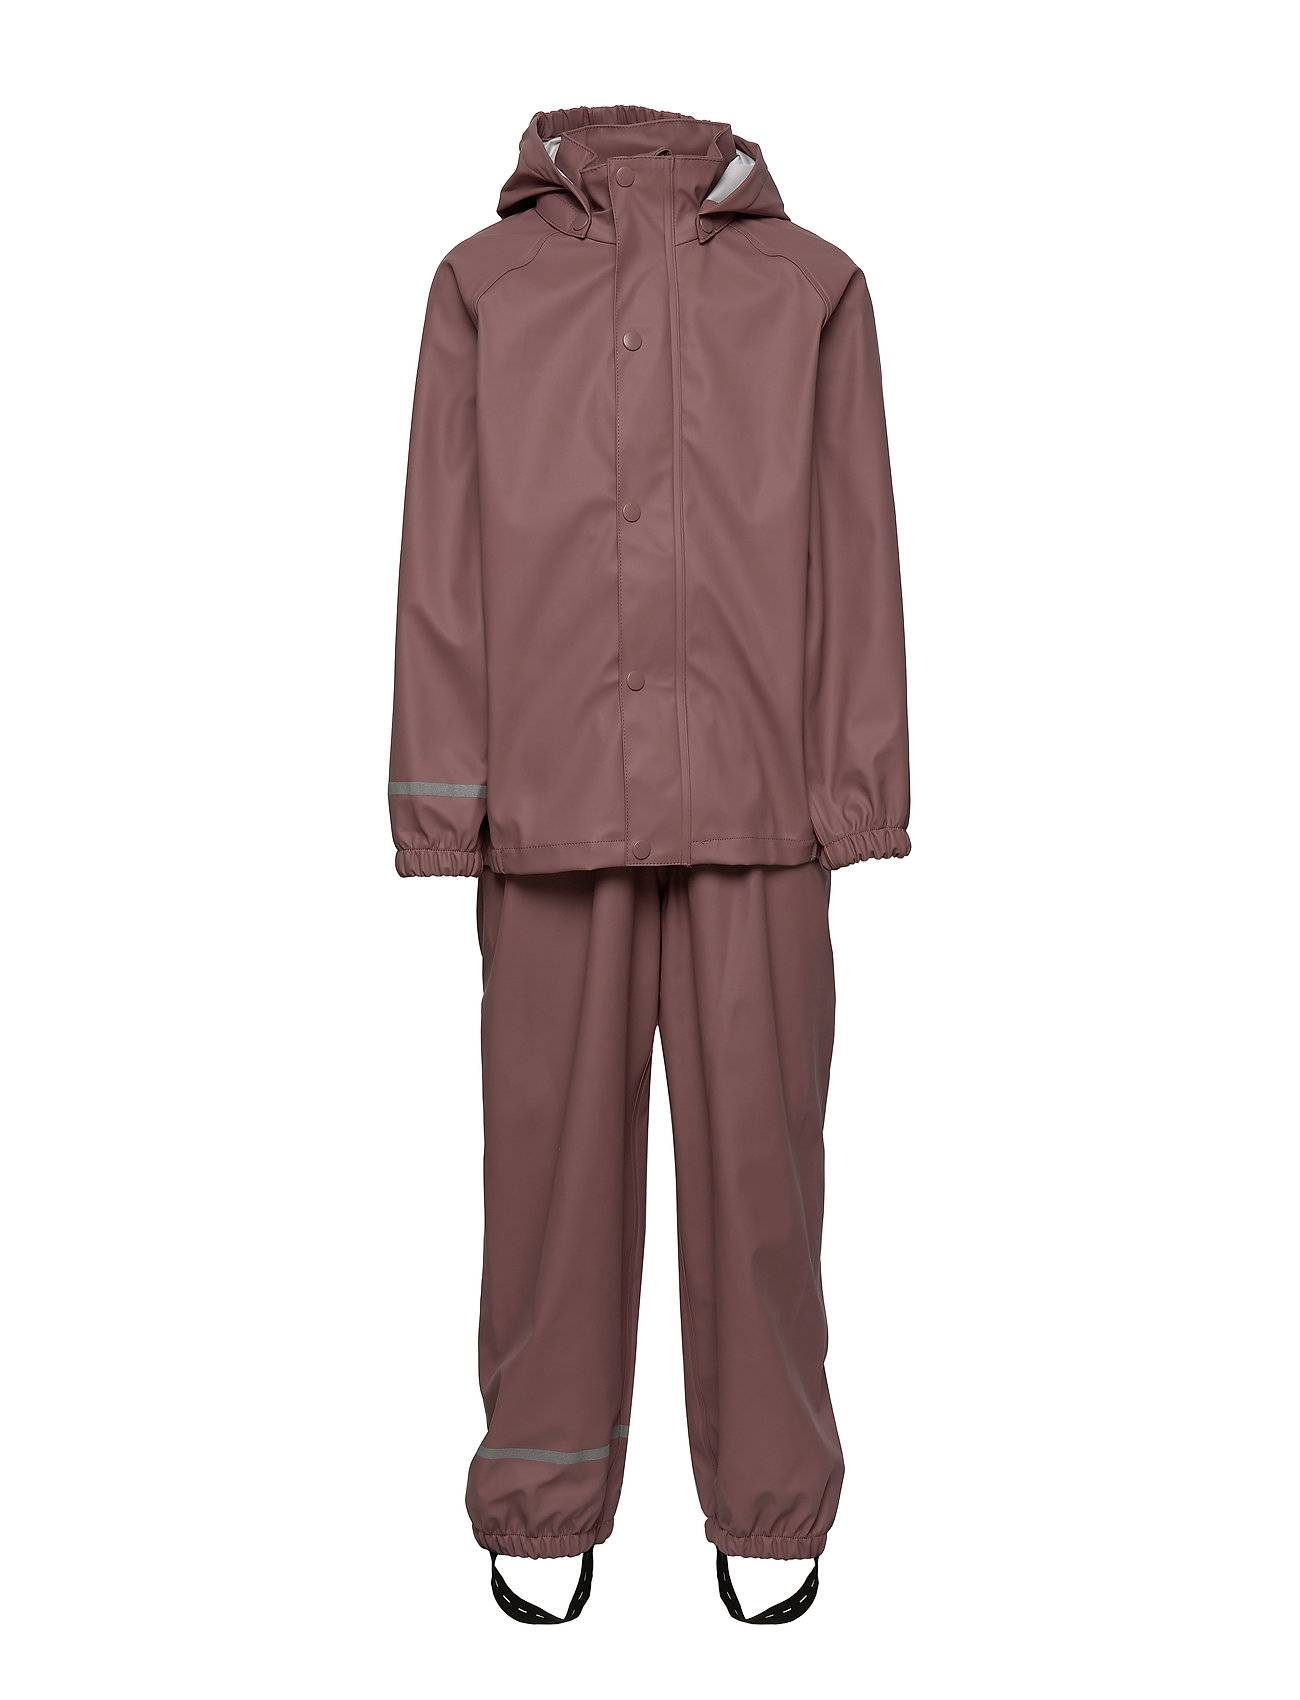 name it Nkndry Rain Set Noos Outerwear Rainwear Sets & Coveralls Liila Name It